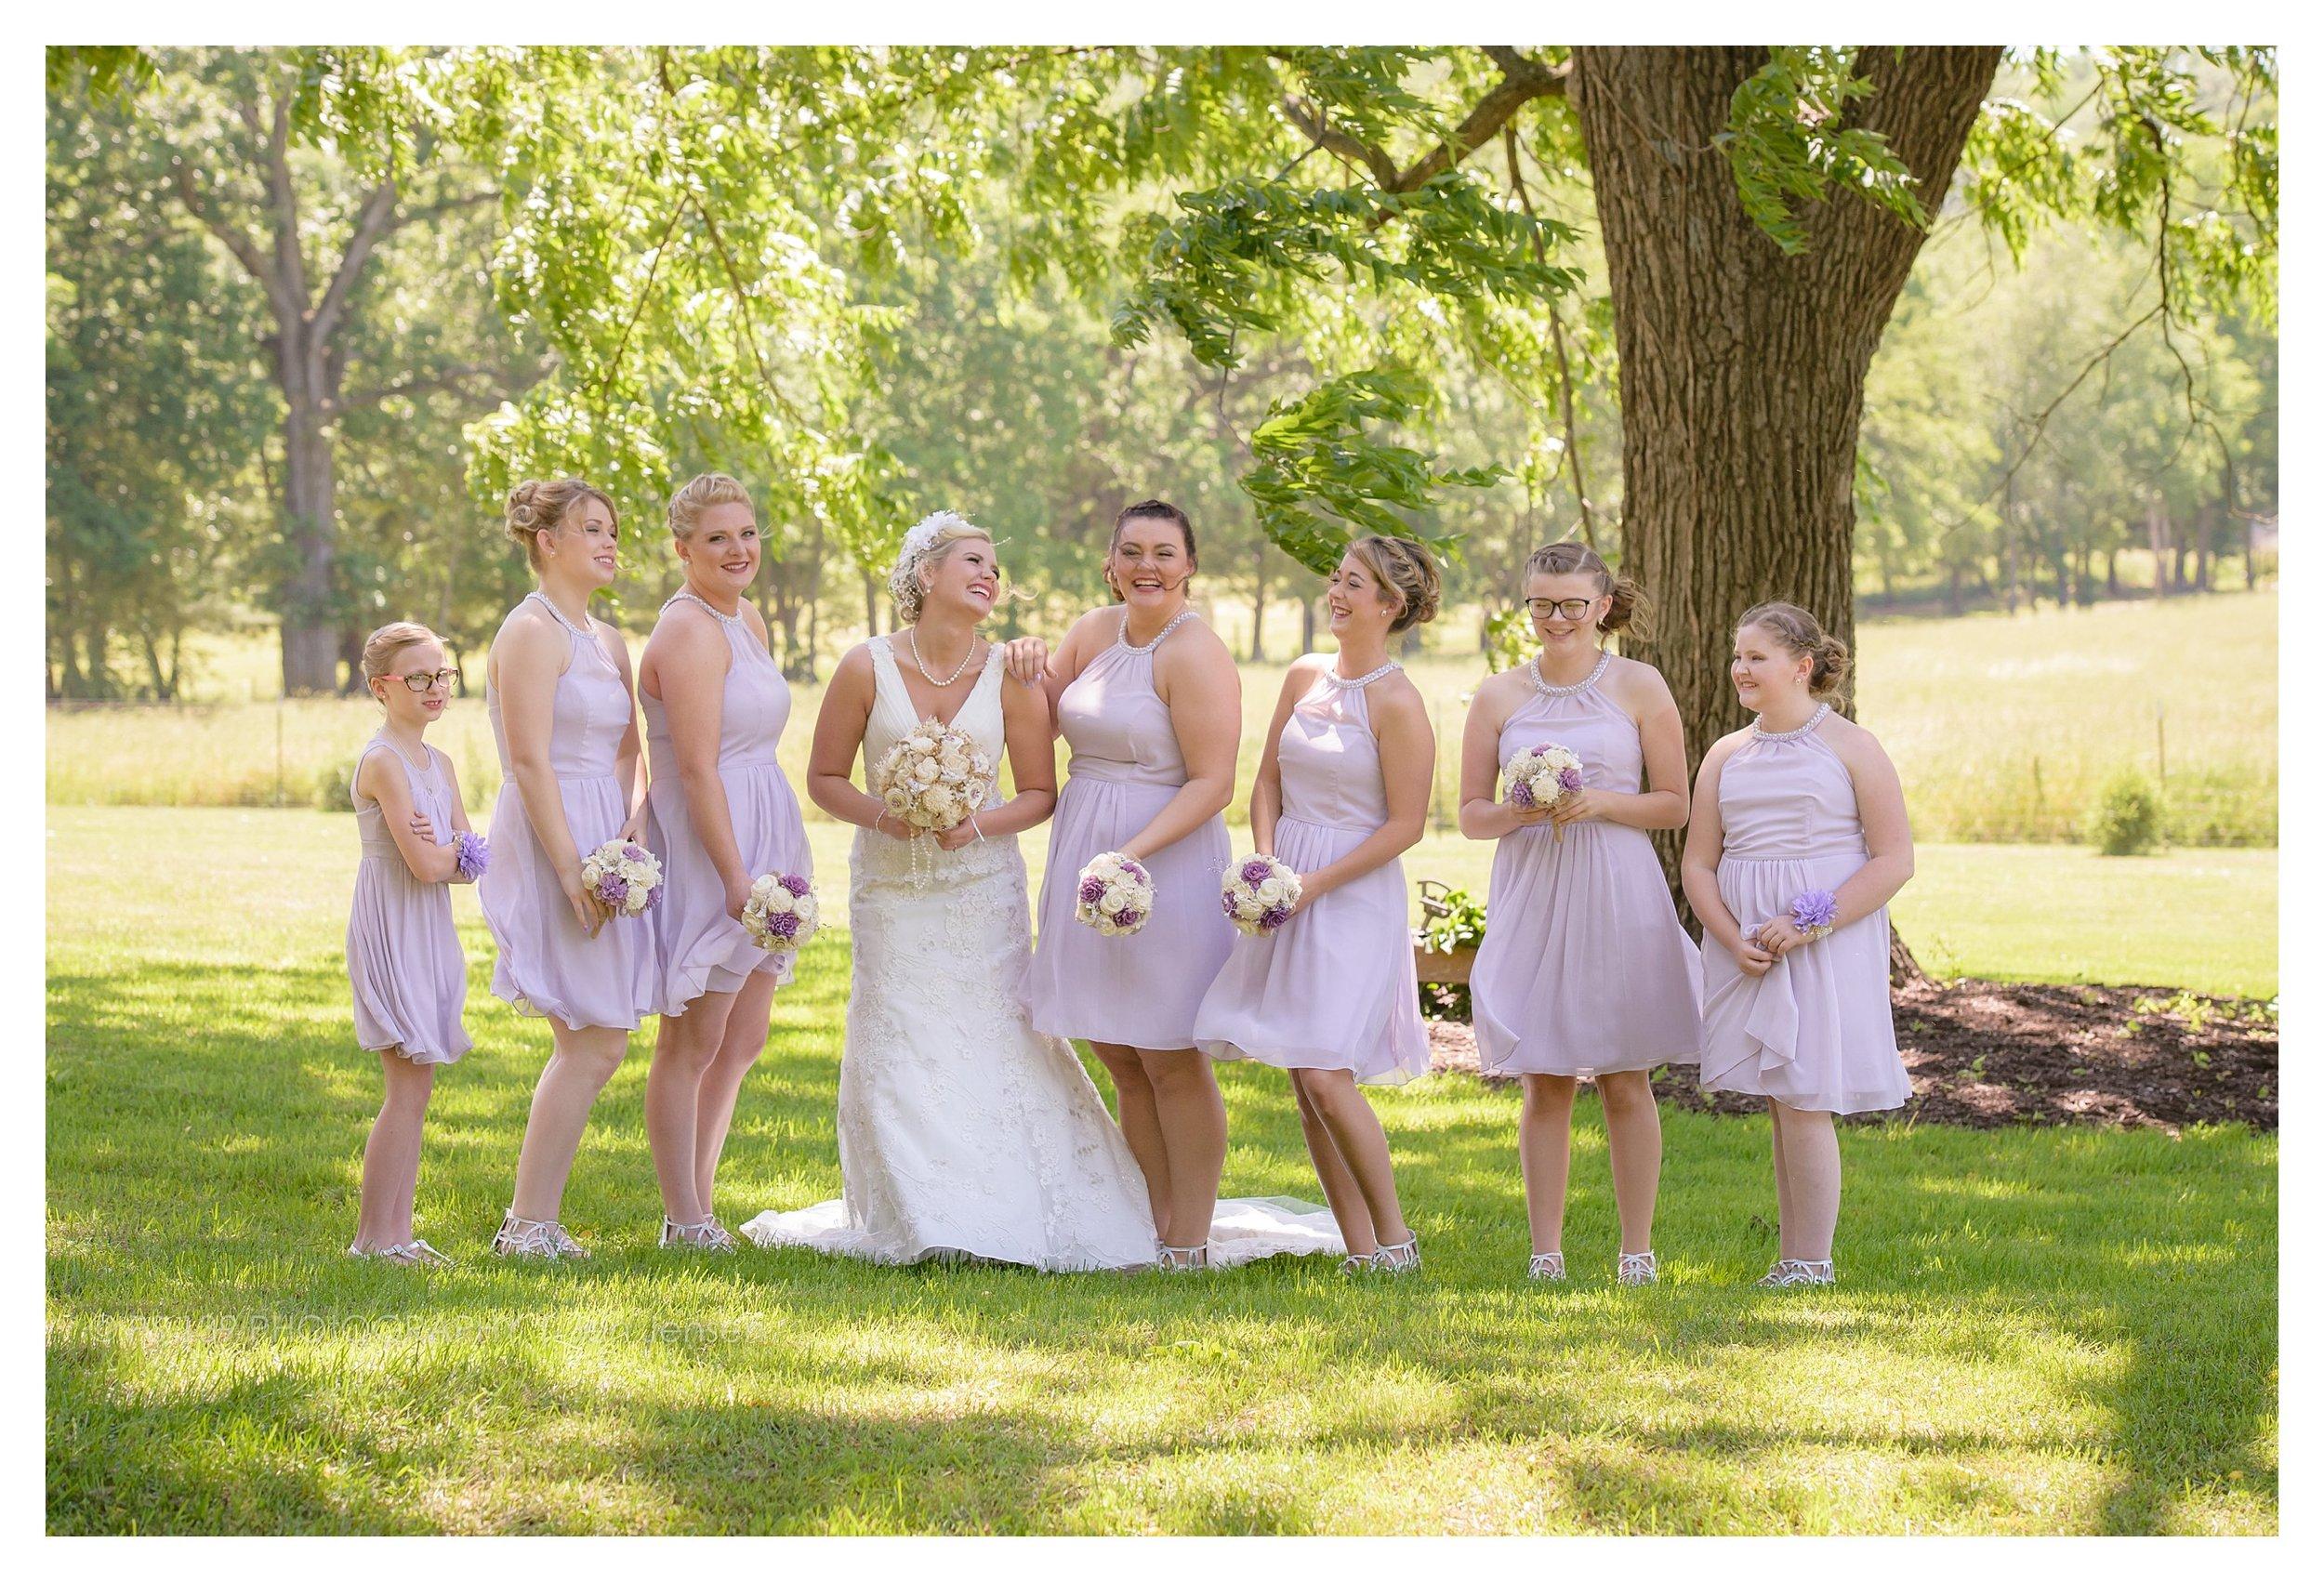 oregon Illinois oak lane farm wisconsin wedding photographer bayfield wi ps 139 photography jen jensen_0266.jpg